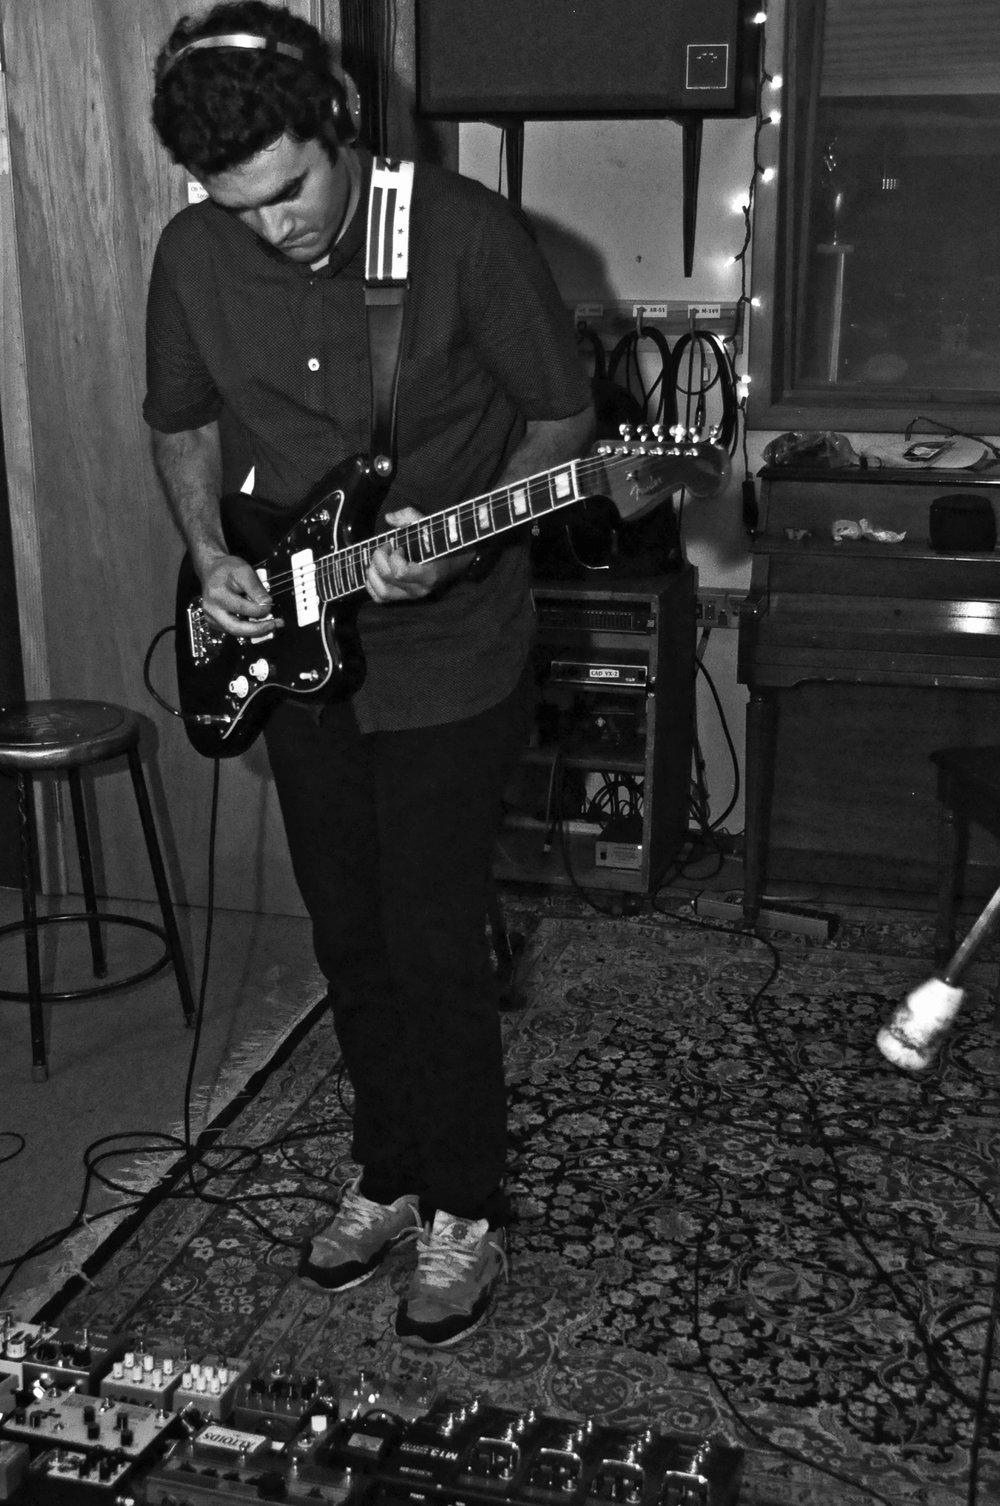 ANDREW MINA - Guitar